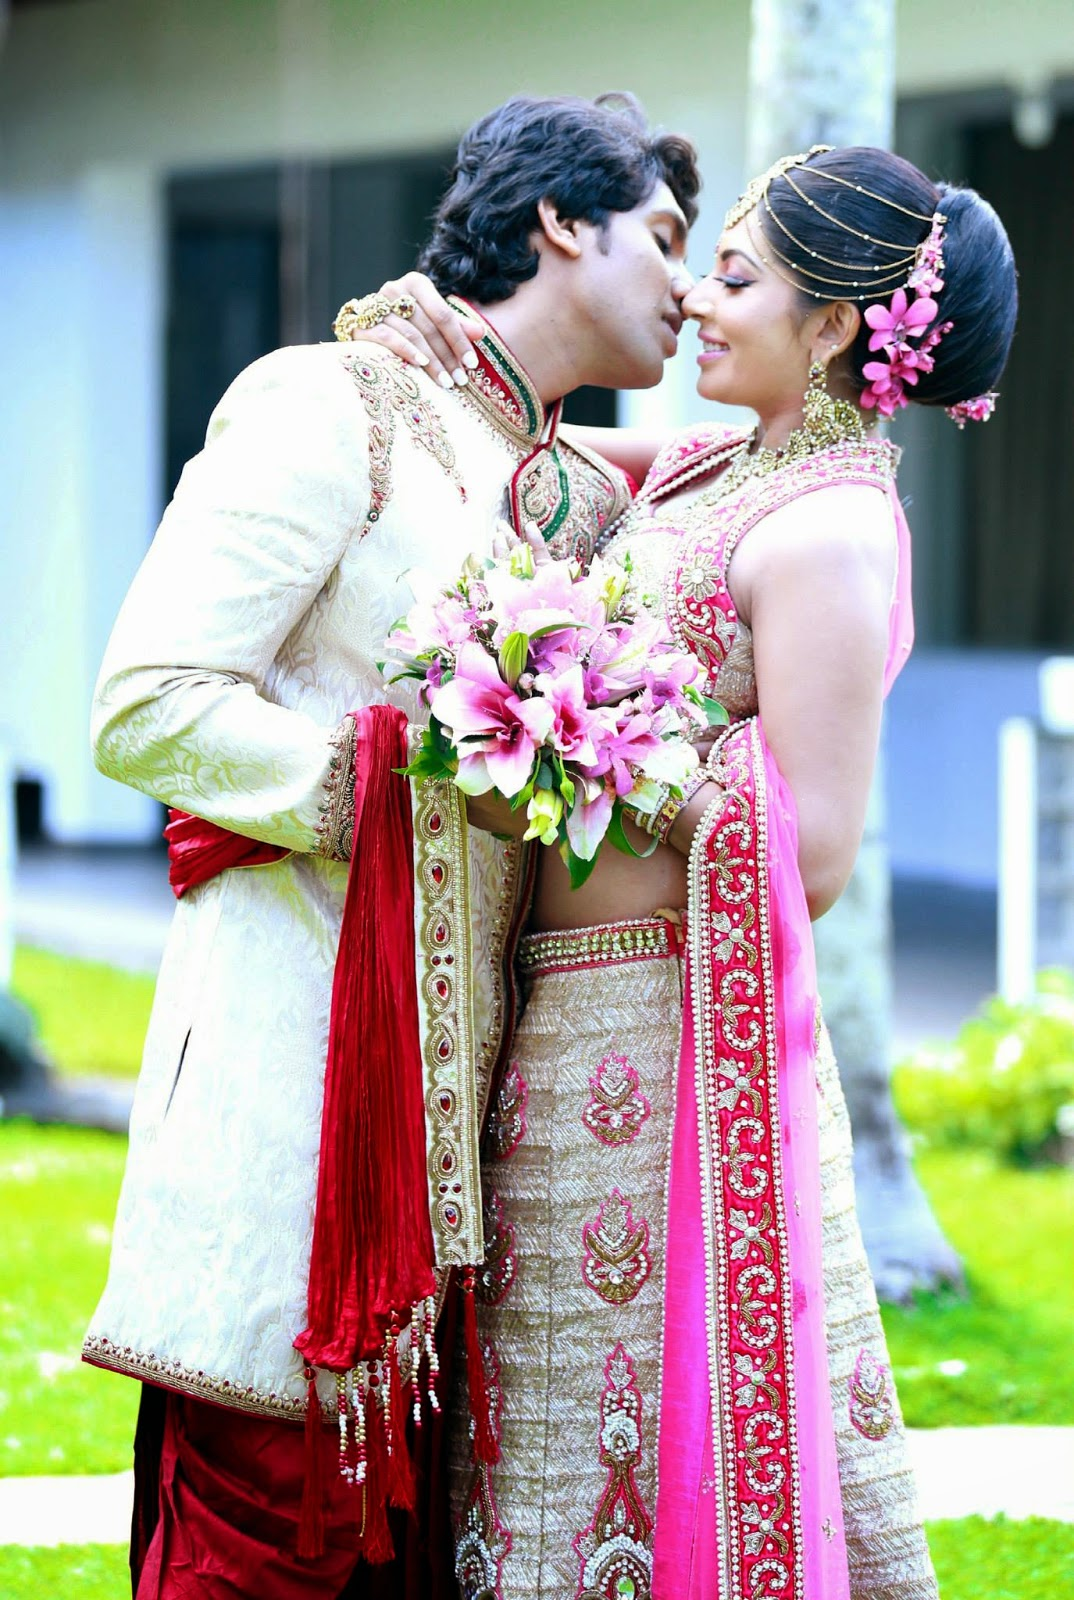 Udari Kaushalya and Sangeeth hot